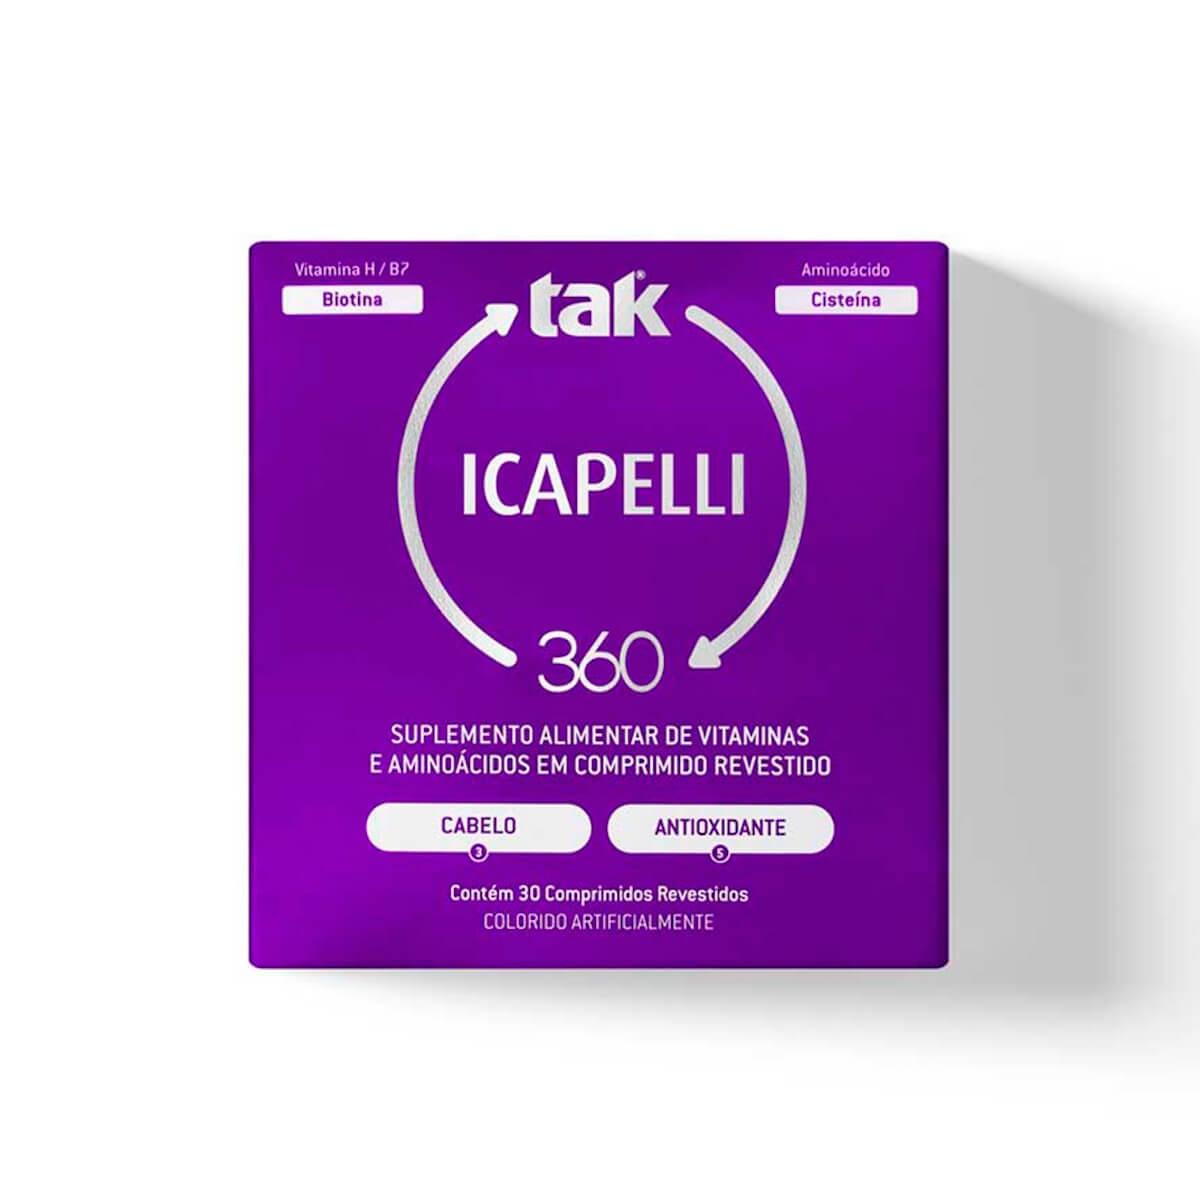 Tak 360 Icapelli 30 Comprimidos Revestidos